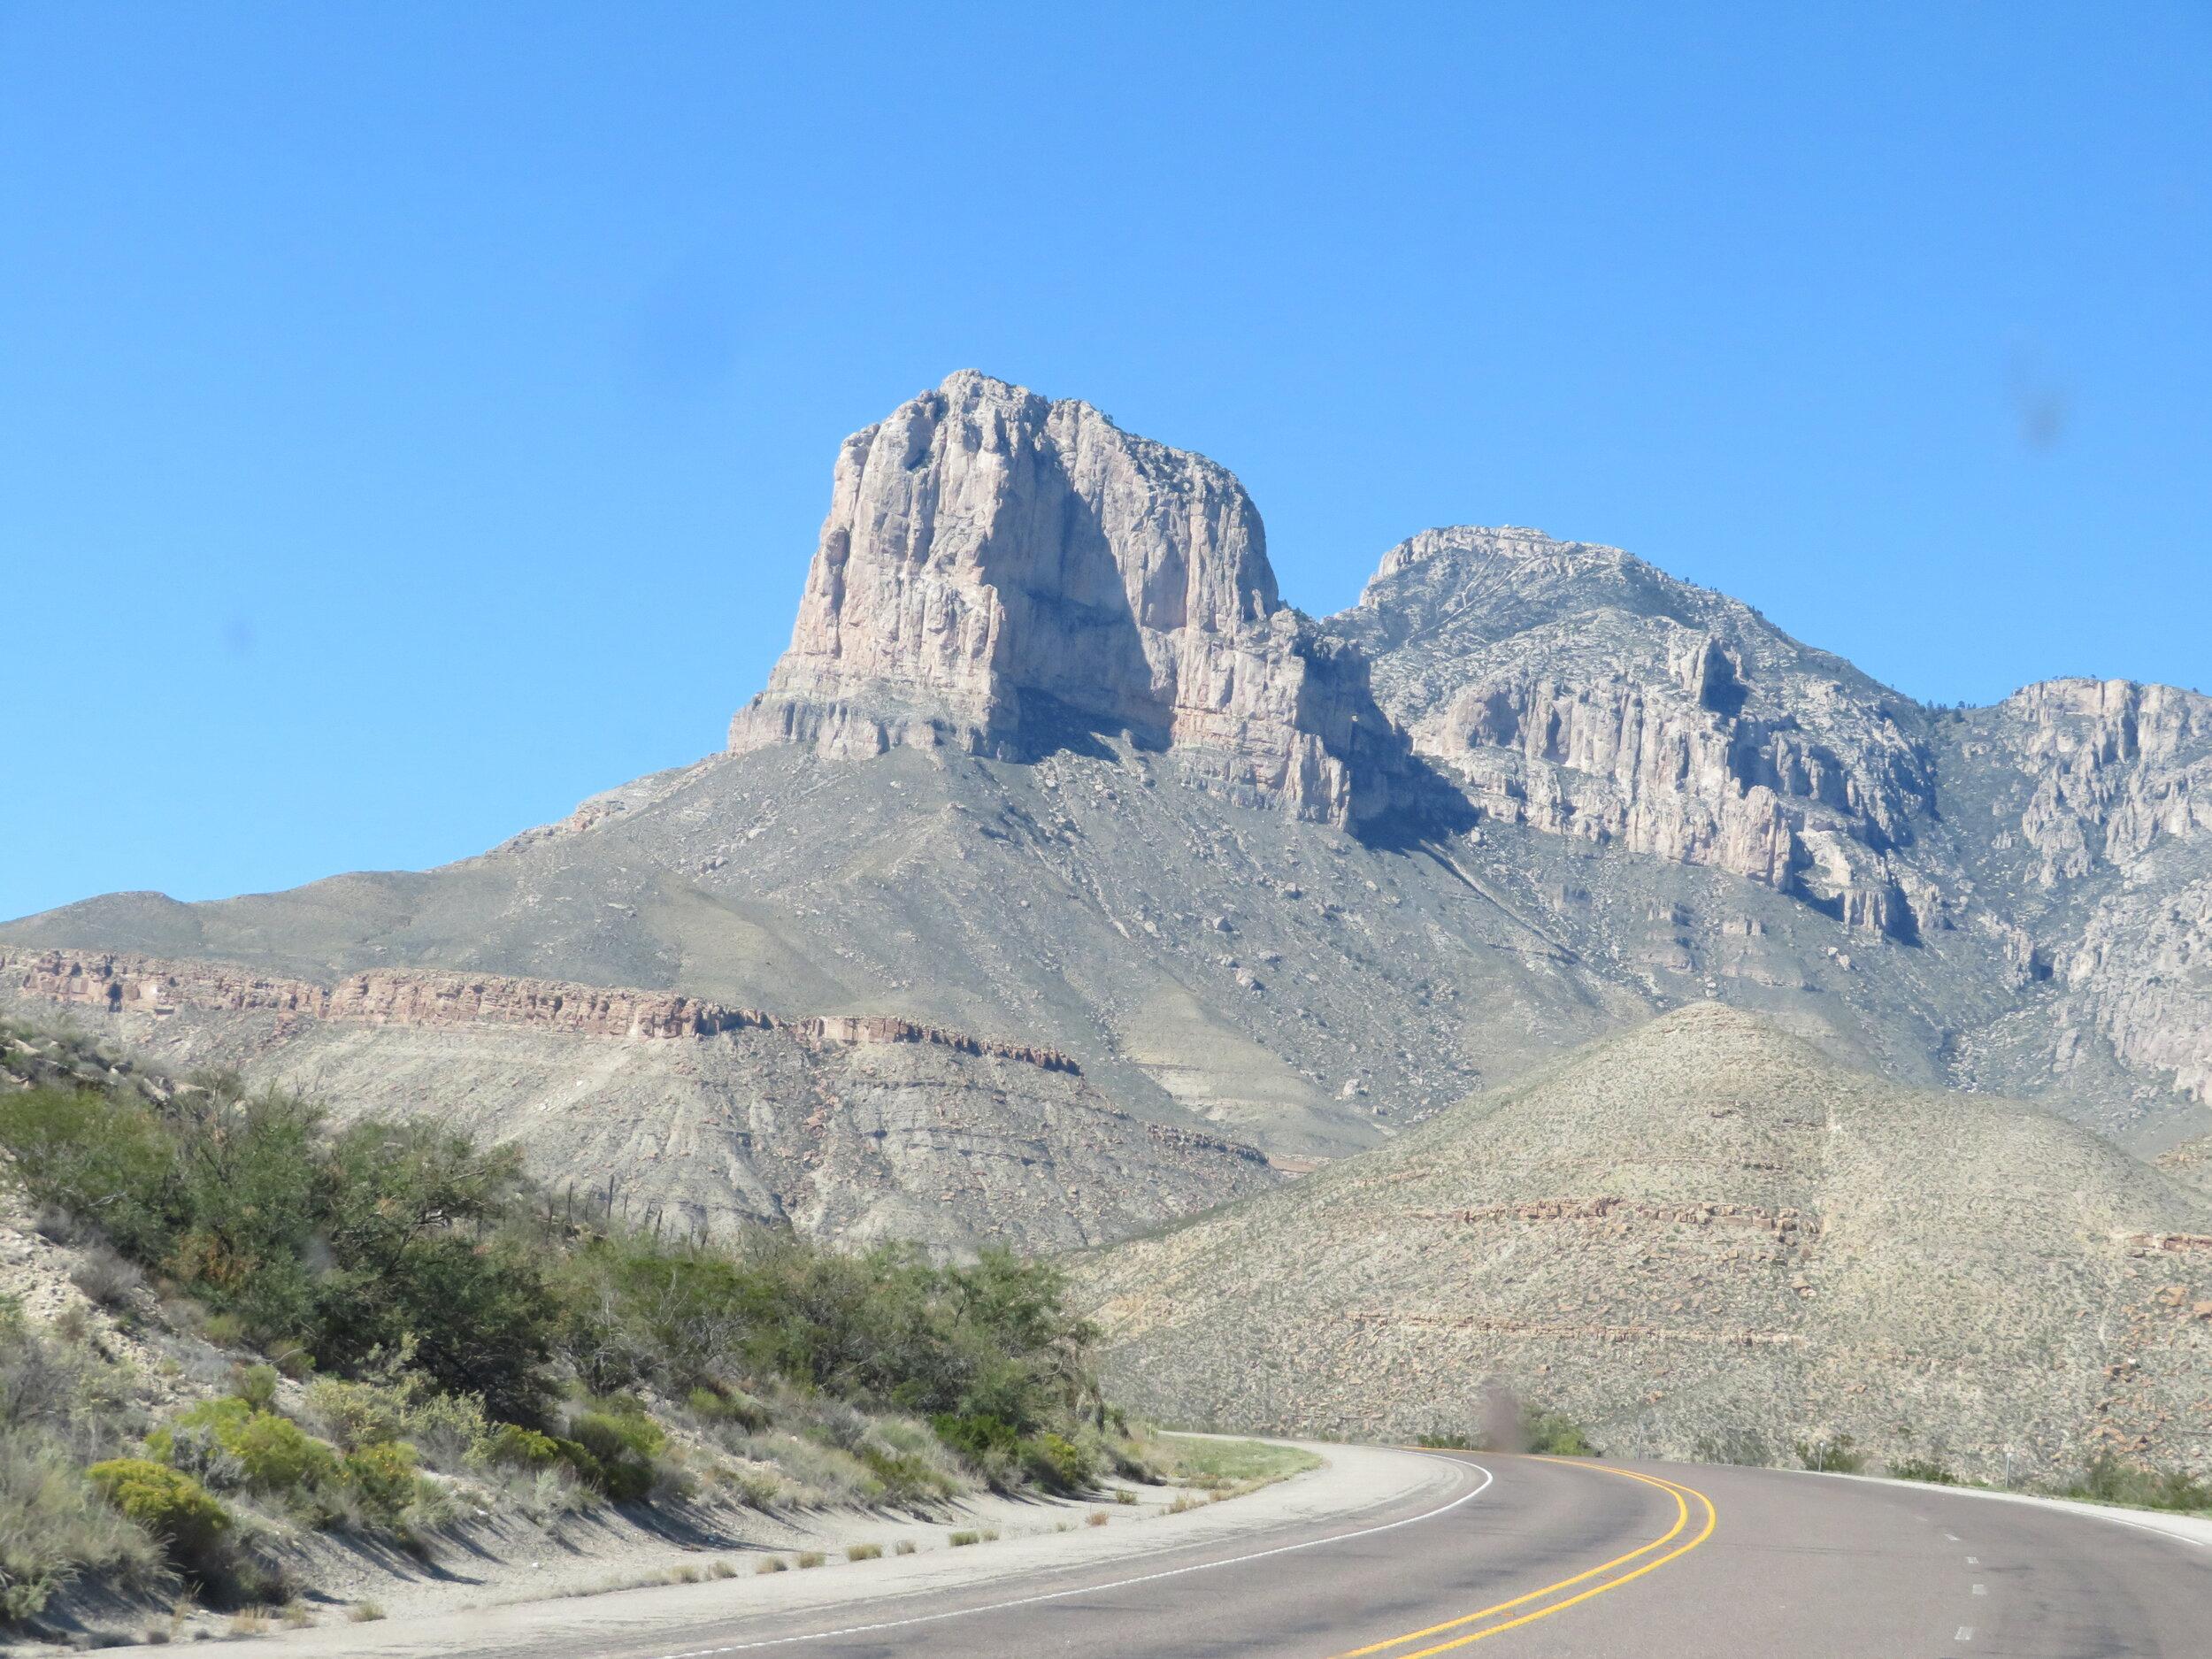 El Capitan dominates the landscape when traveling on Rtes 62/180.